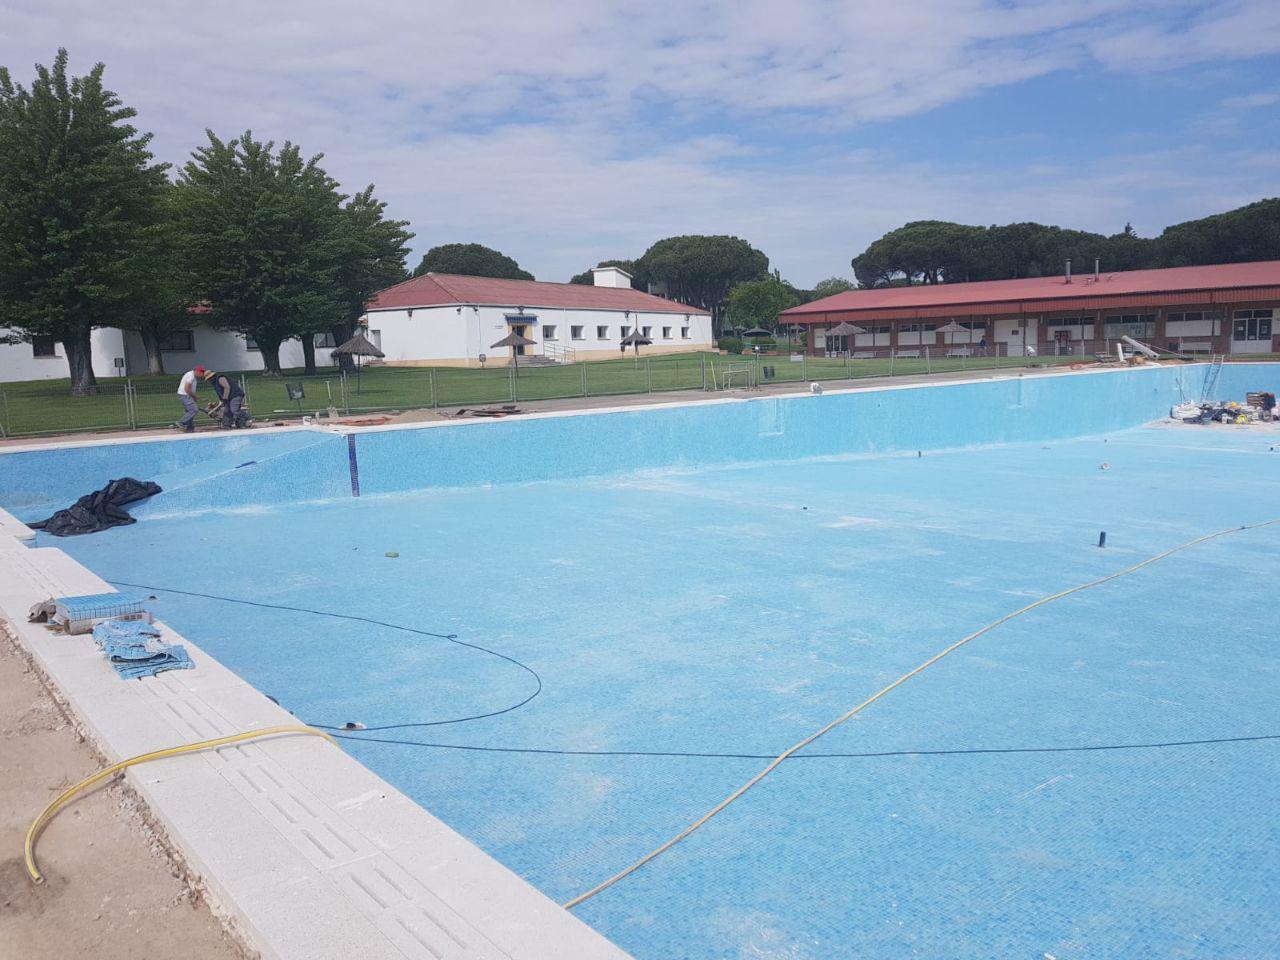 diaz cubero, díaz cubero, piscina del centro deportivo militar san jorge